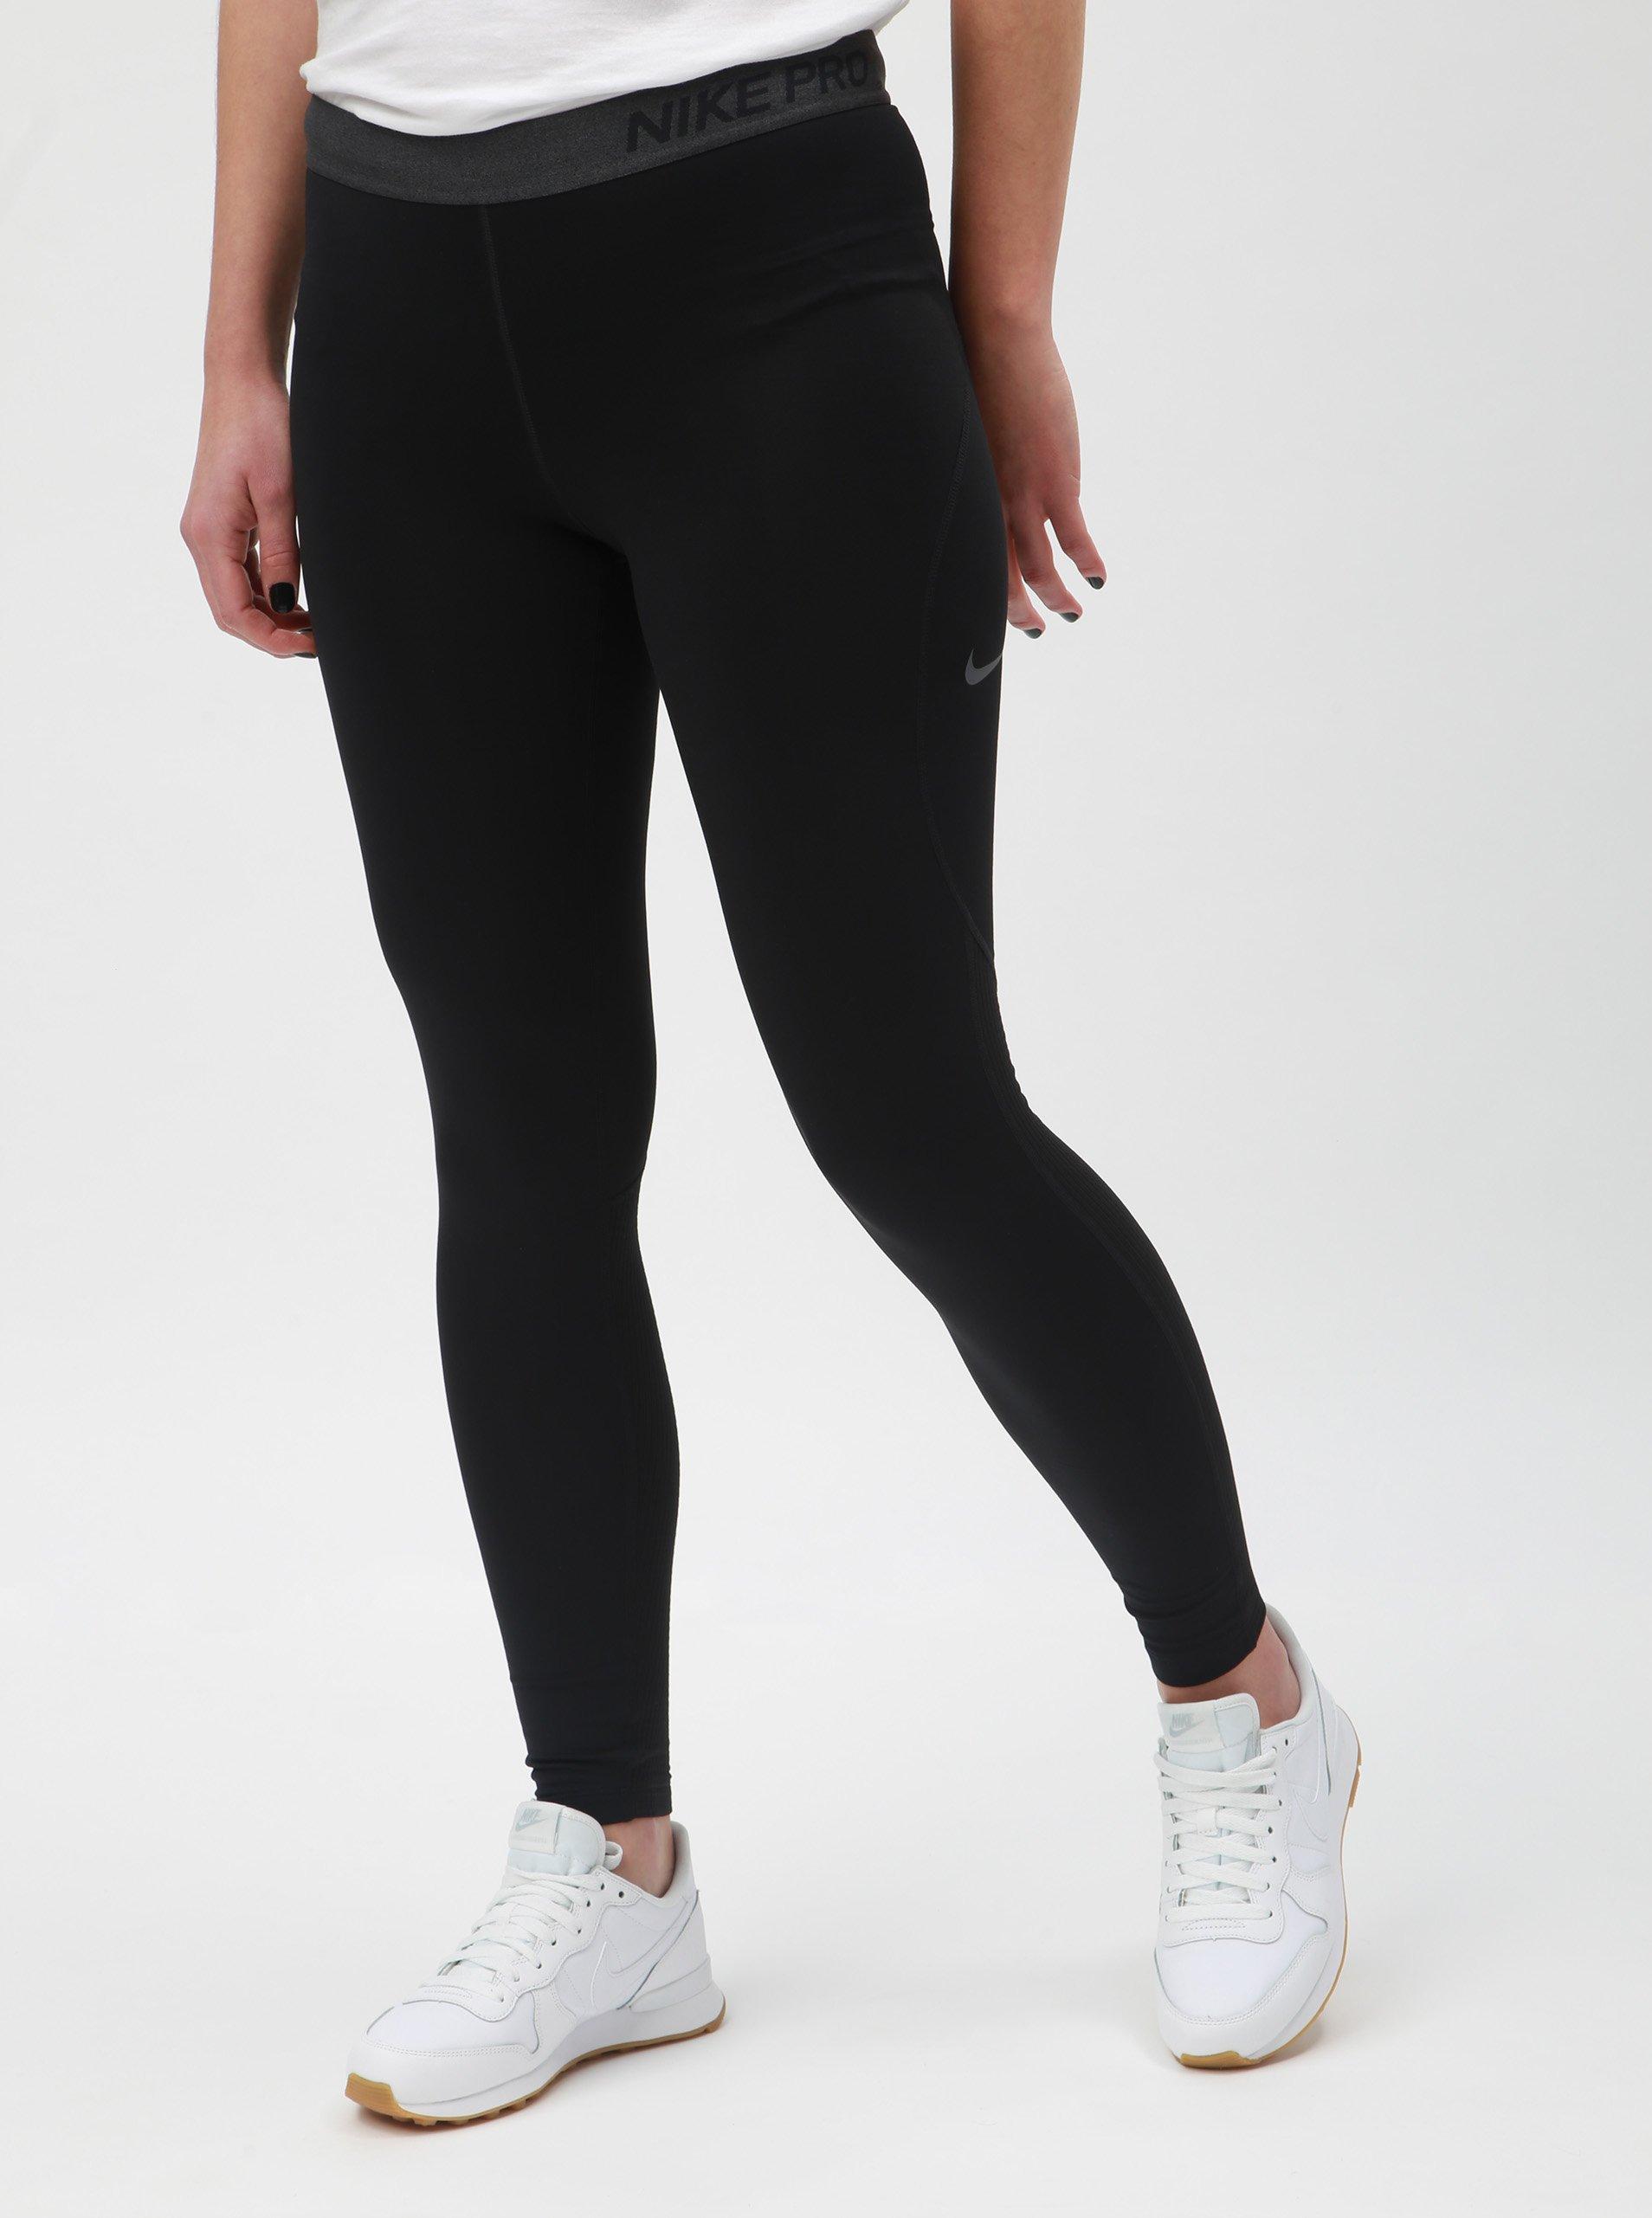 Čierne dámske funkčné legíny Nike